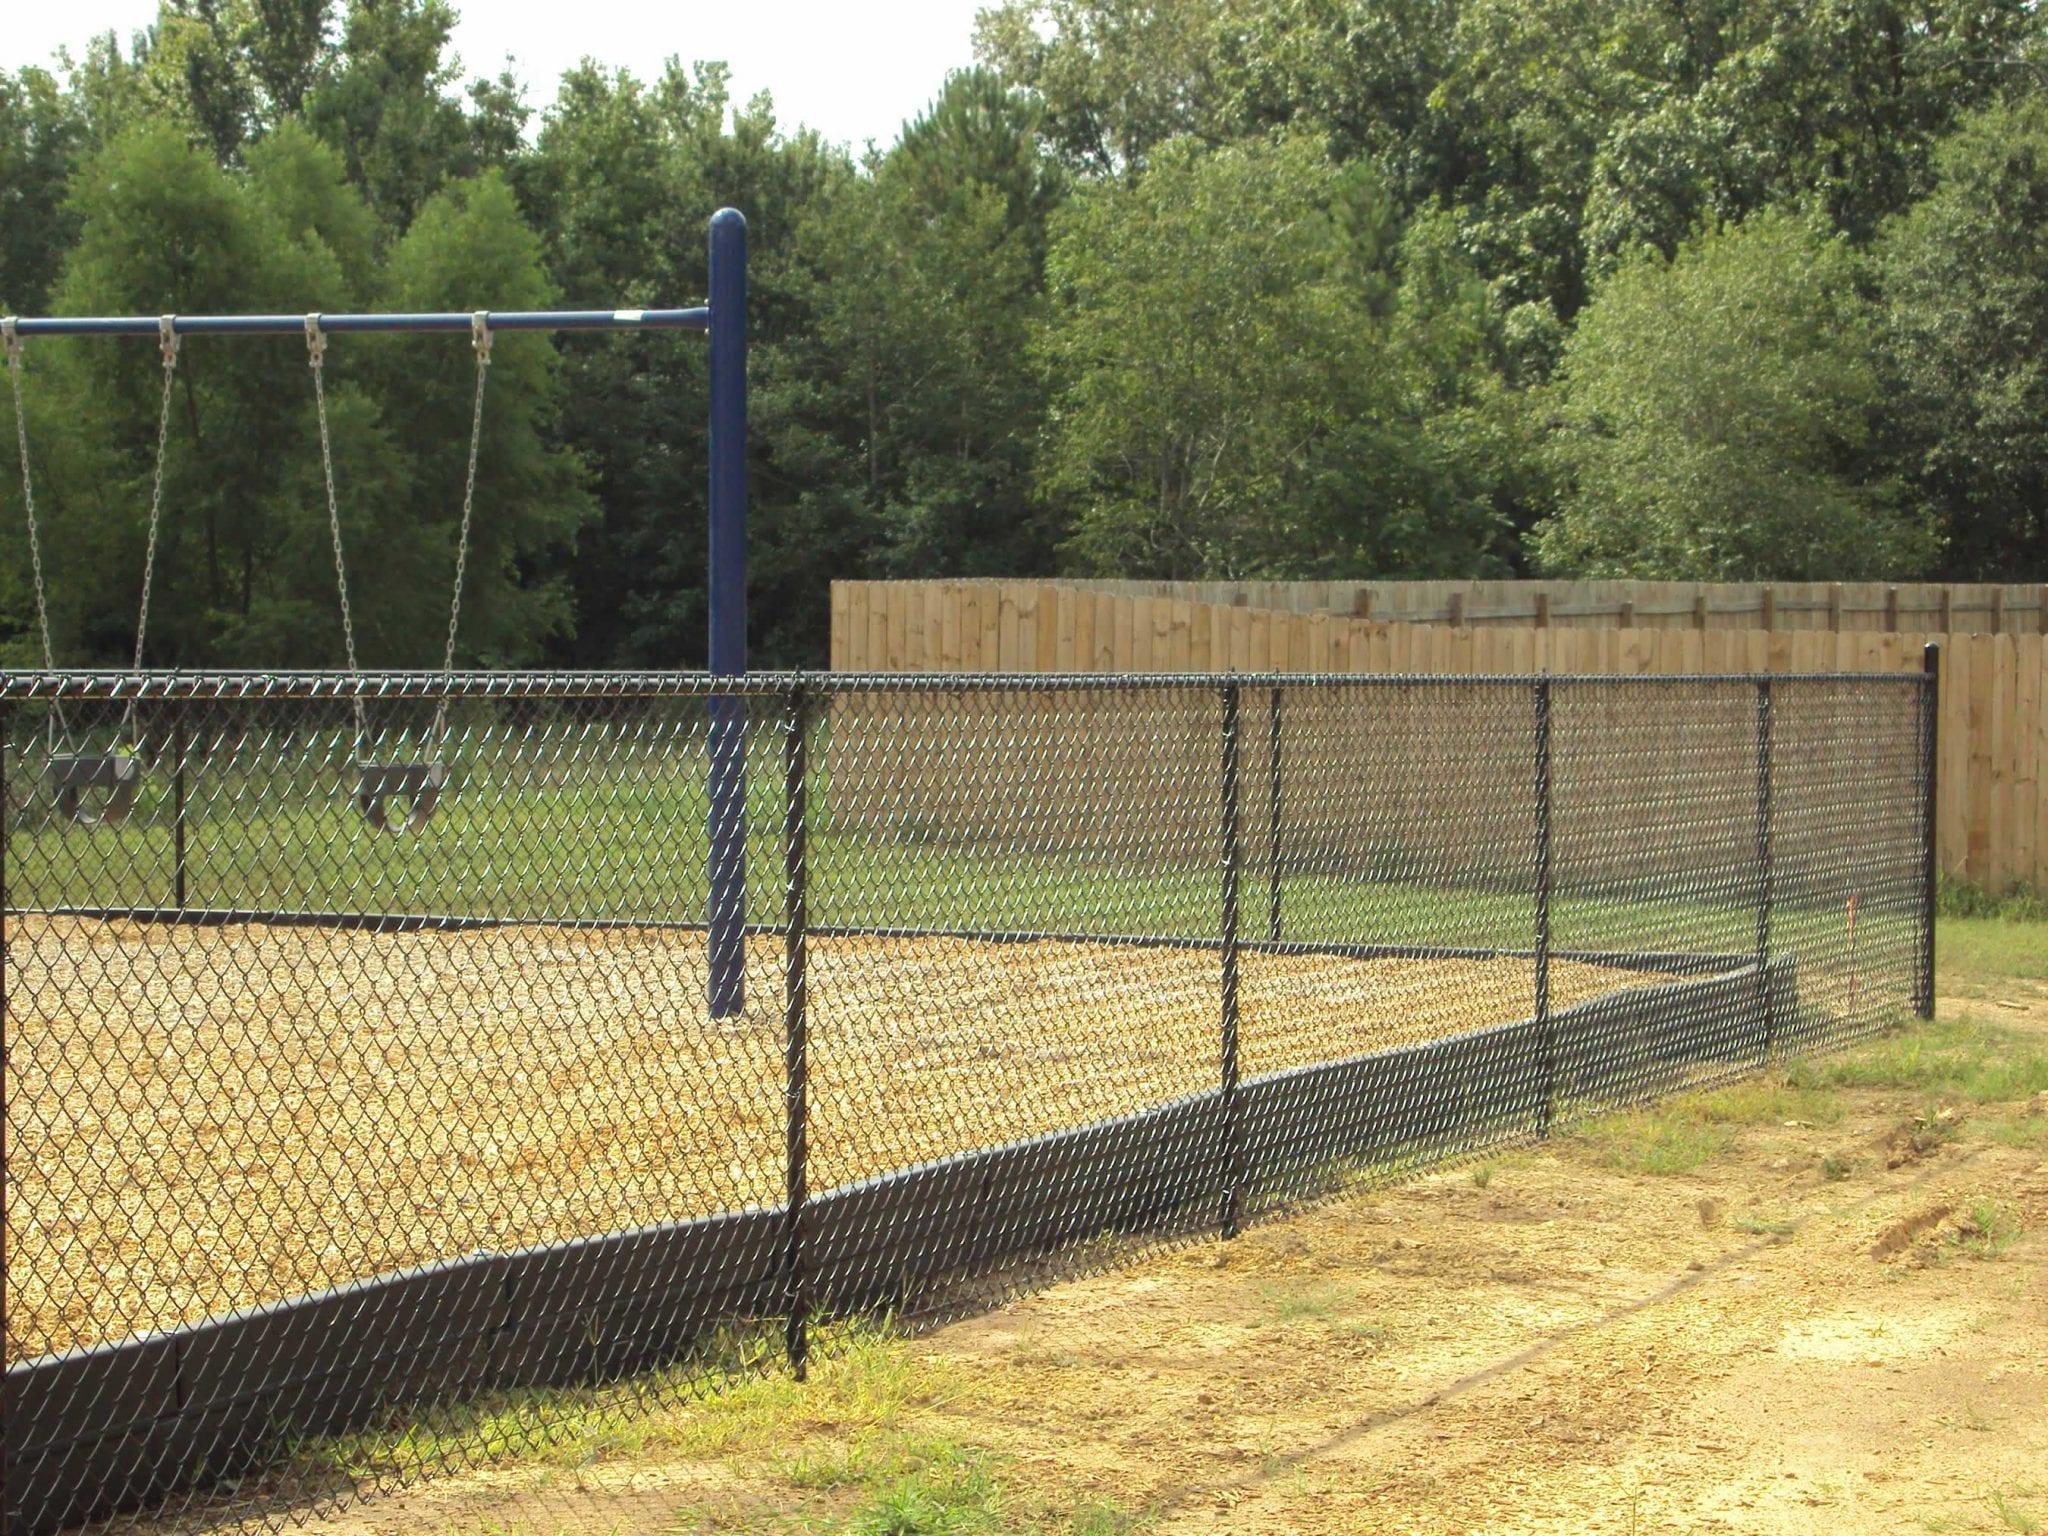 mercial chain link fencing birmingham al fence services